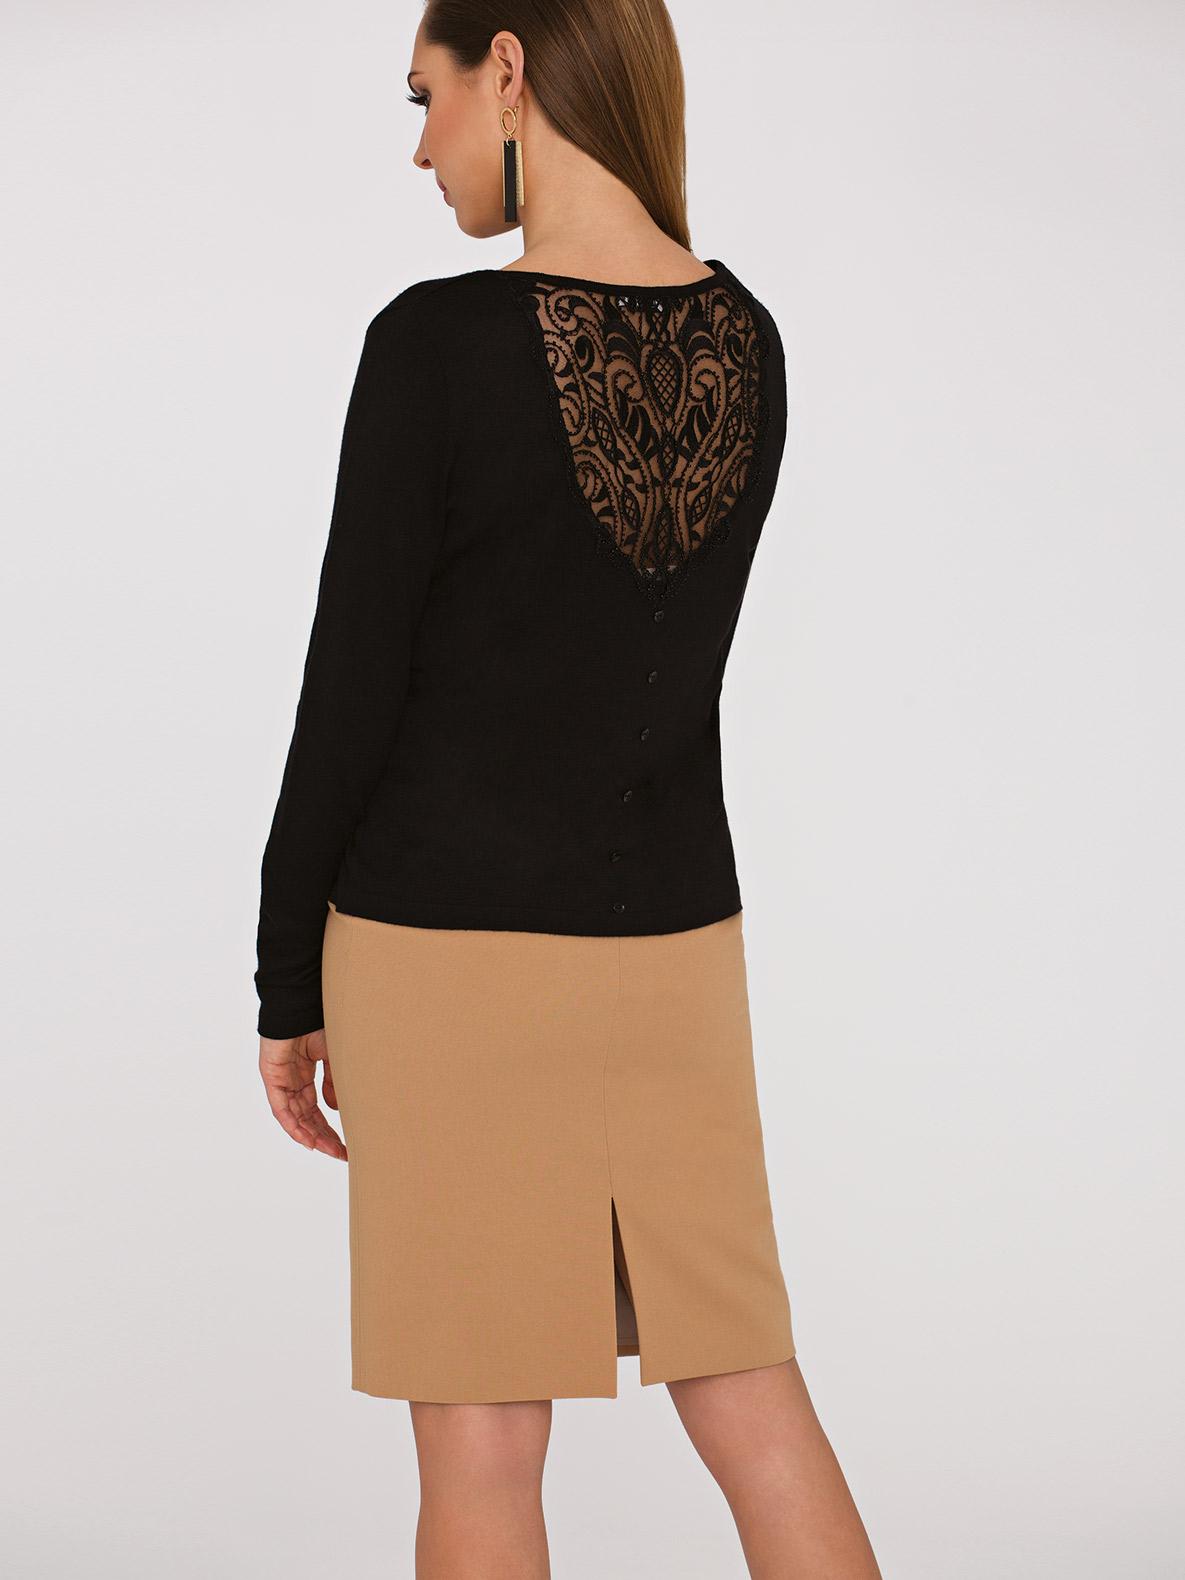 Sweater Tomaco